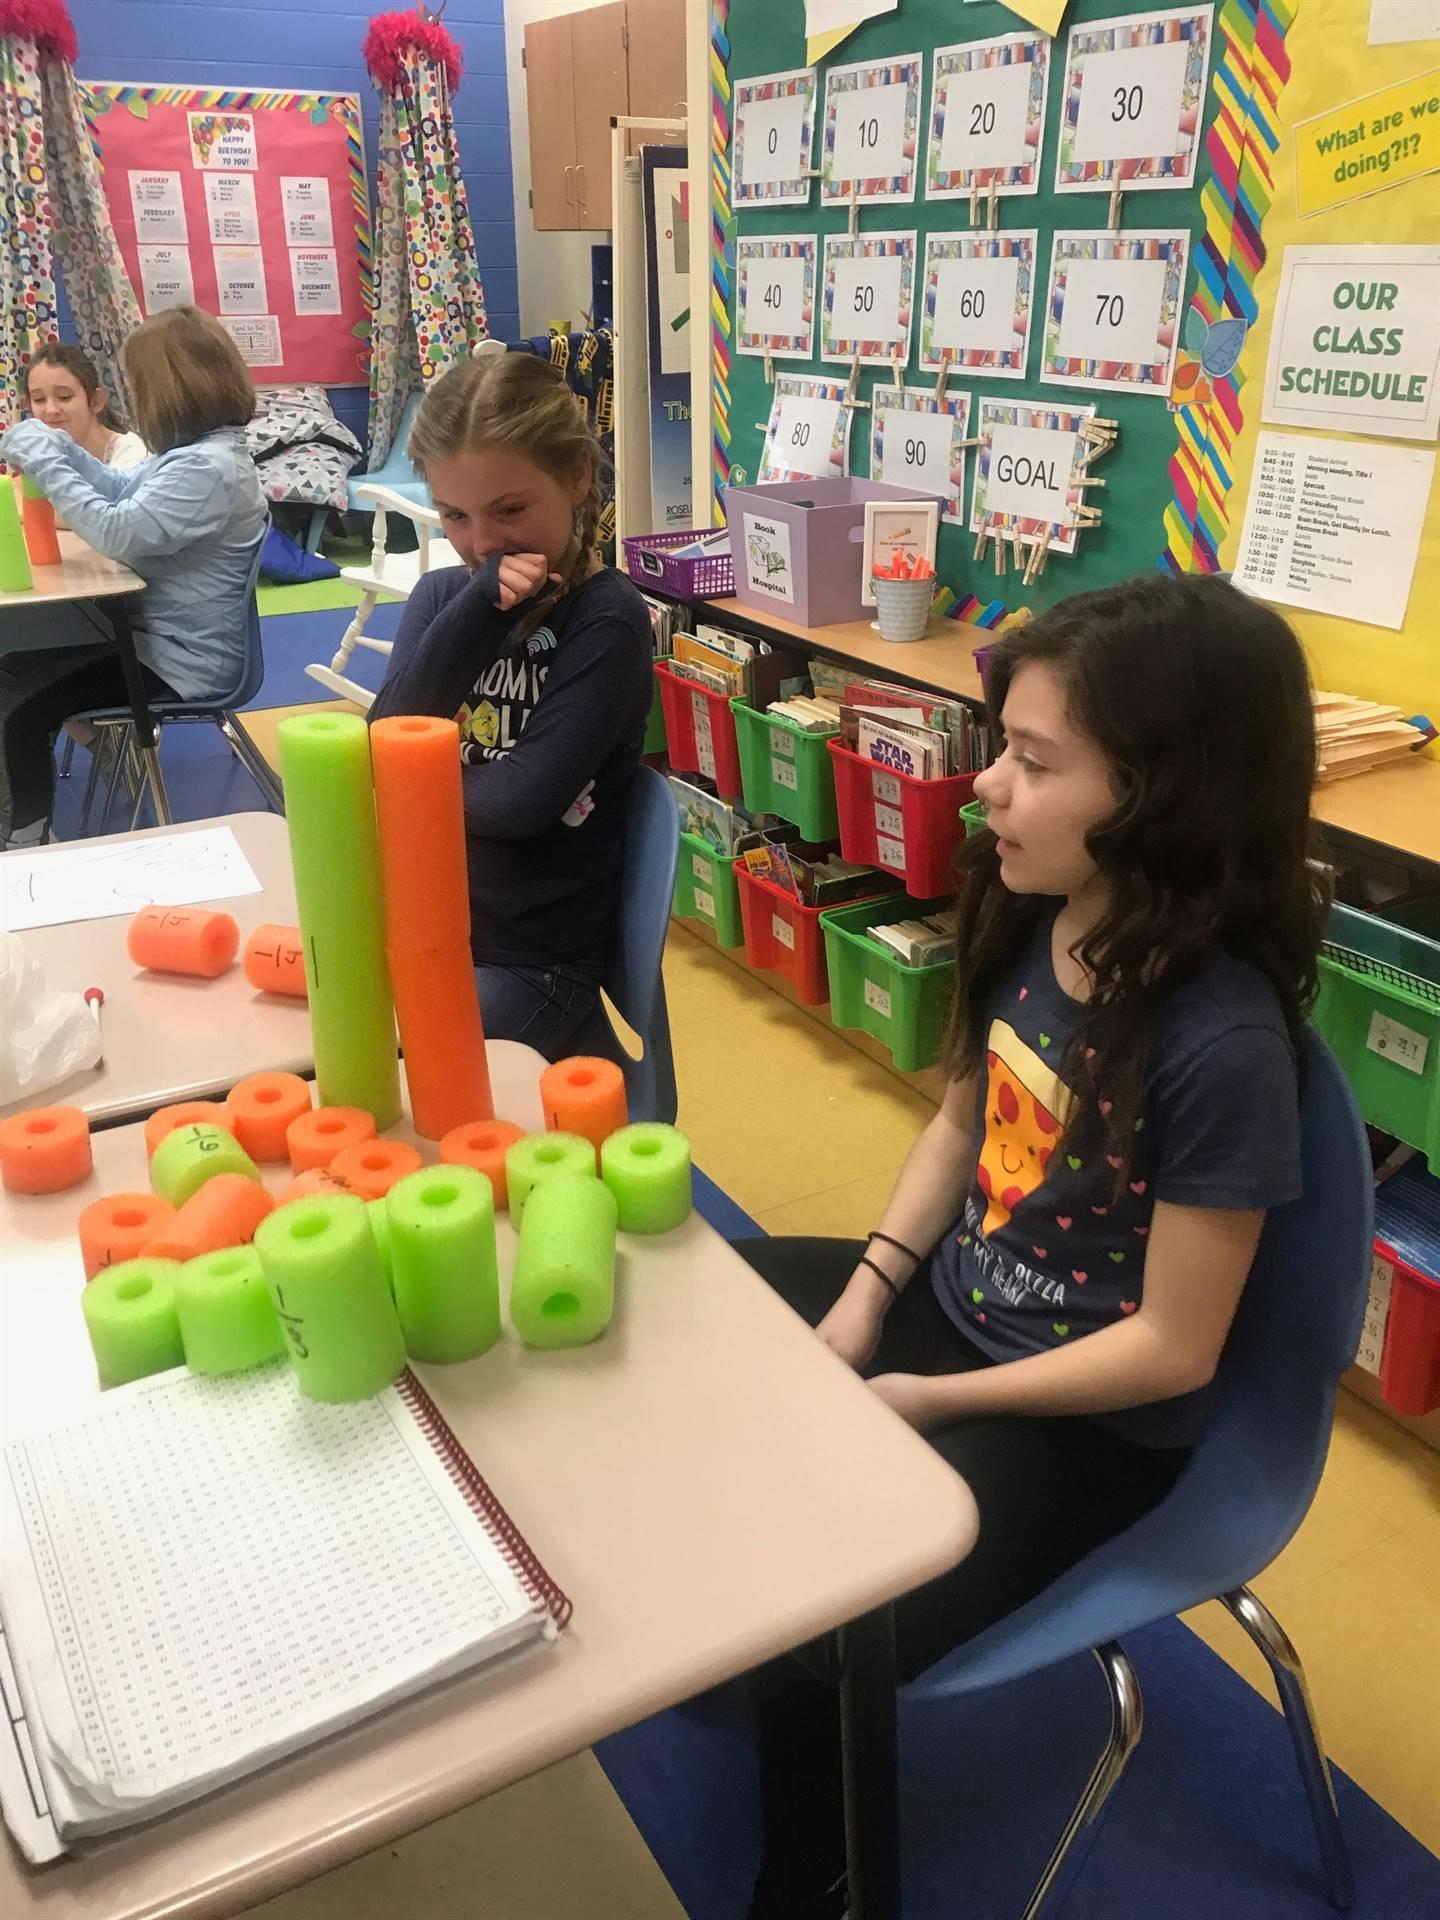 photo of 4th grade math class using math manipulatives